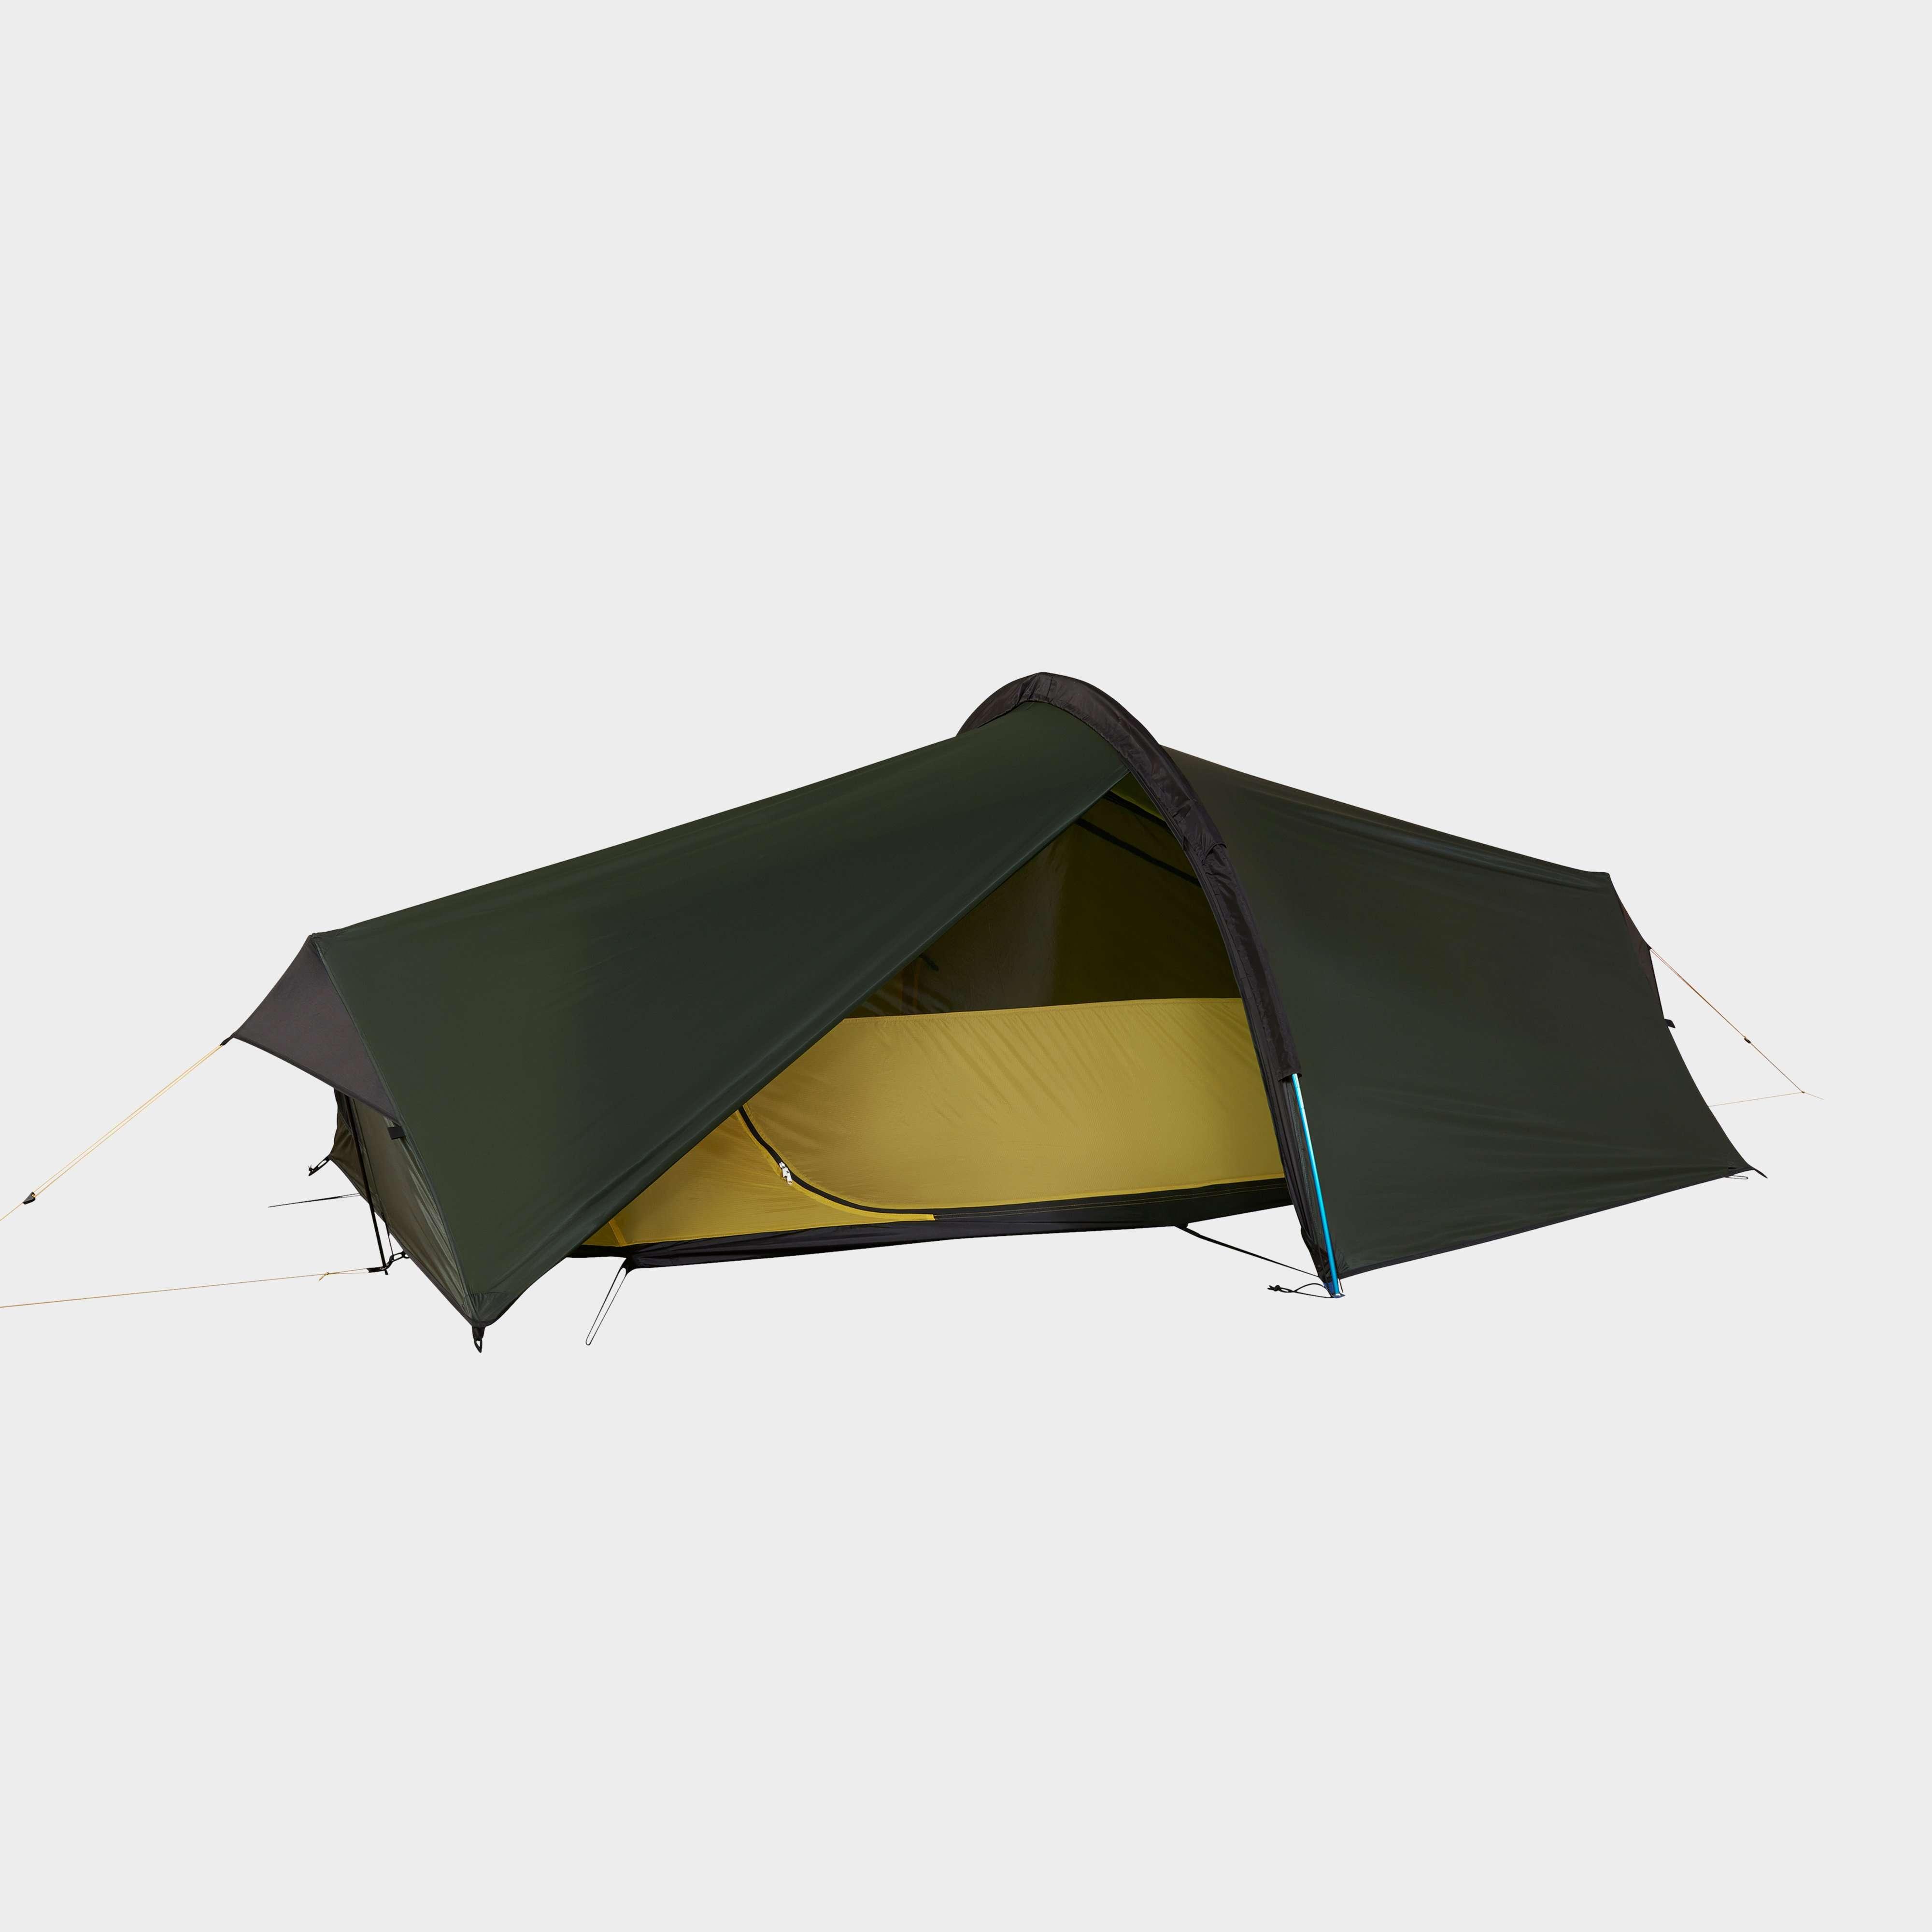 TERRA NOVA Laser Competition 2 Man Tent